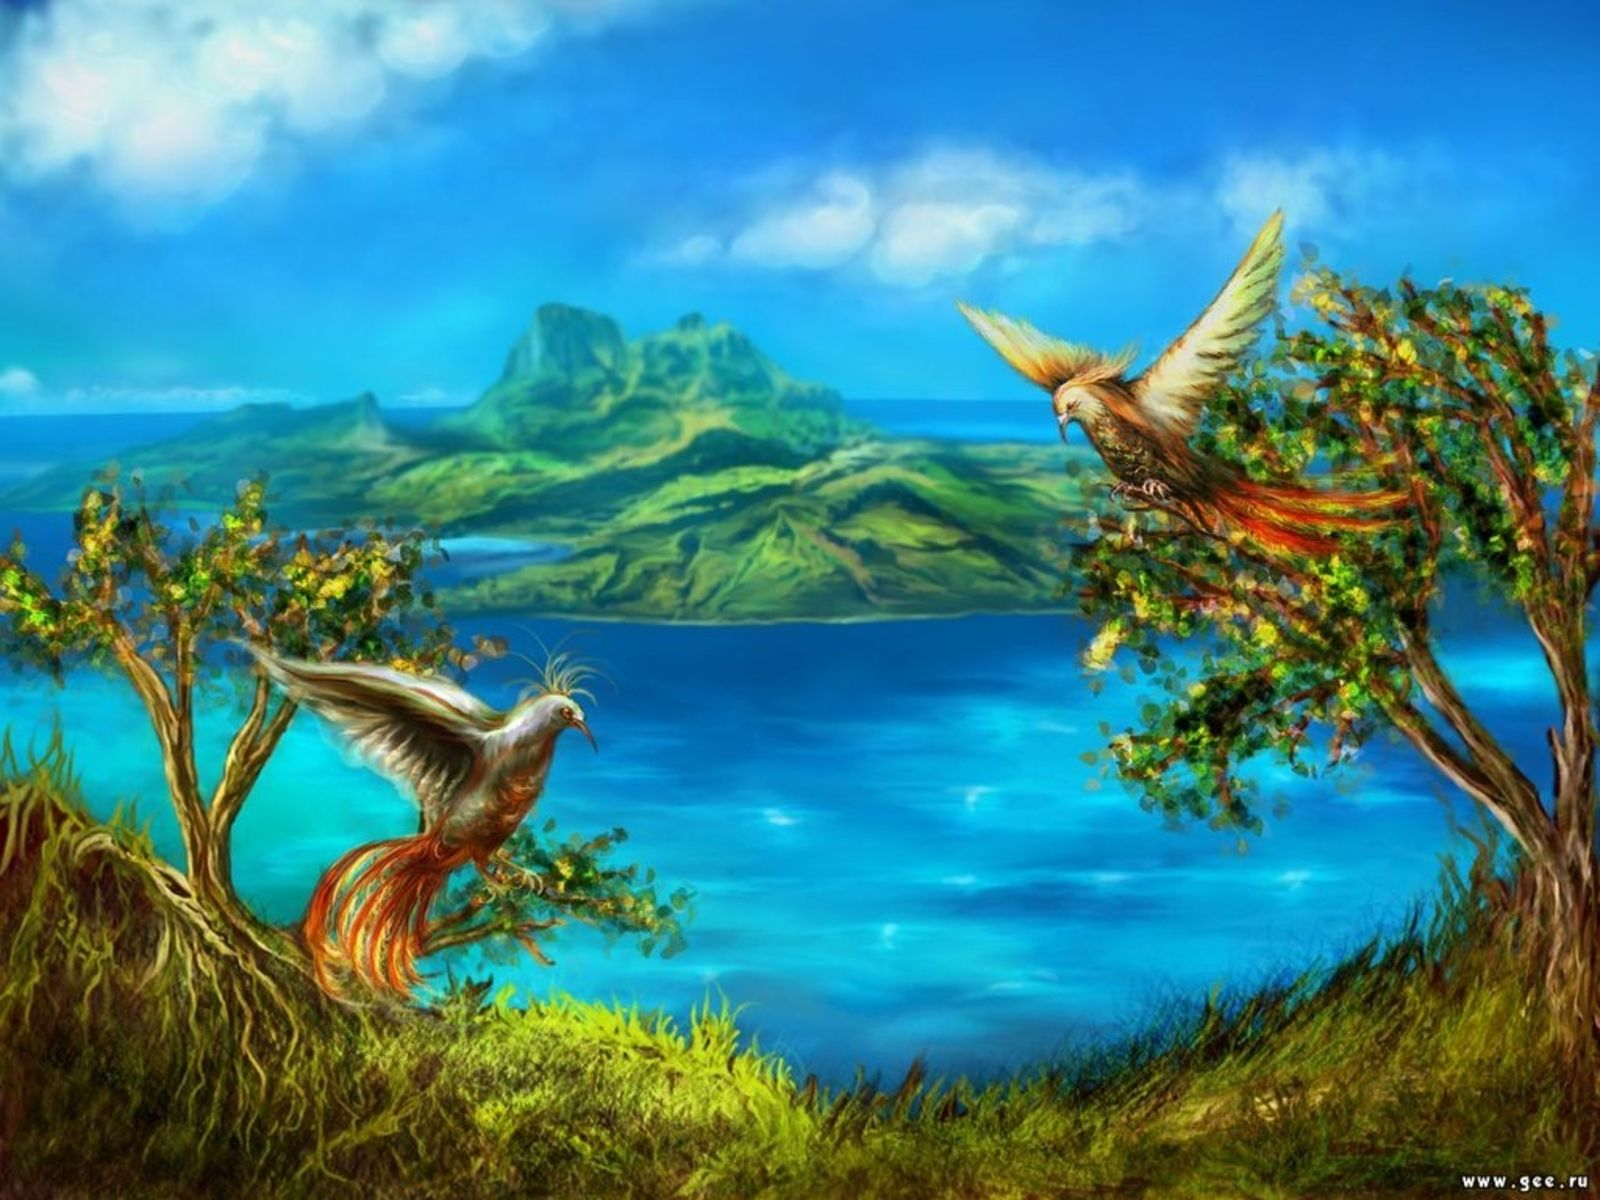 Beautiful Nature Art